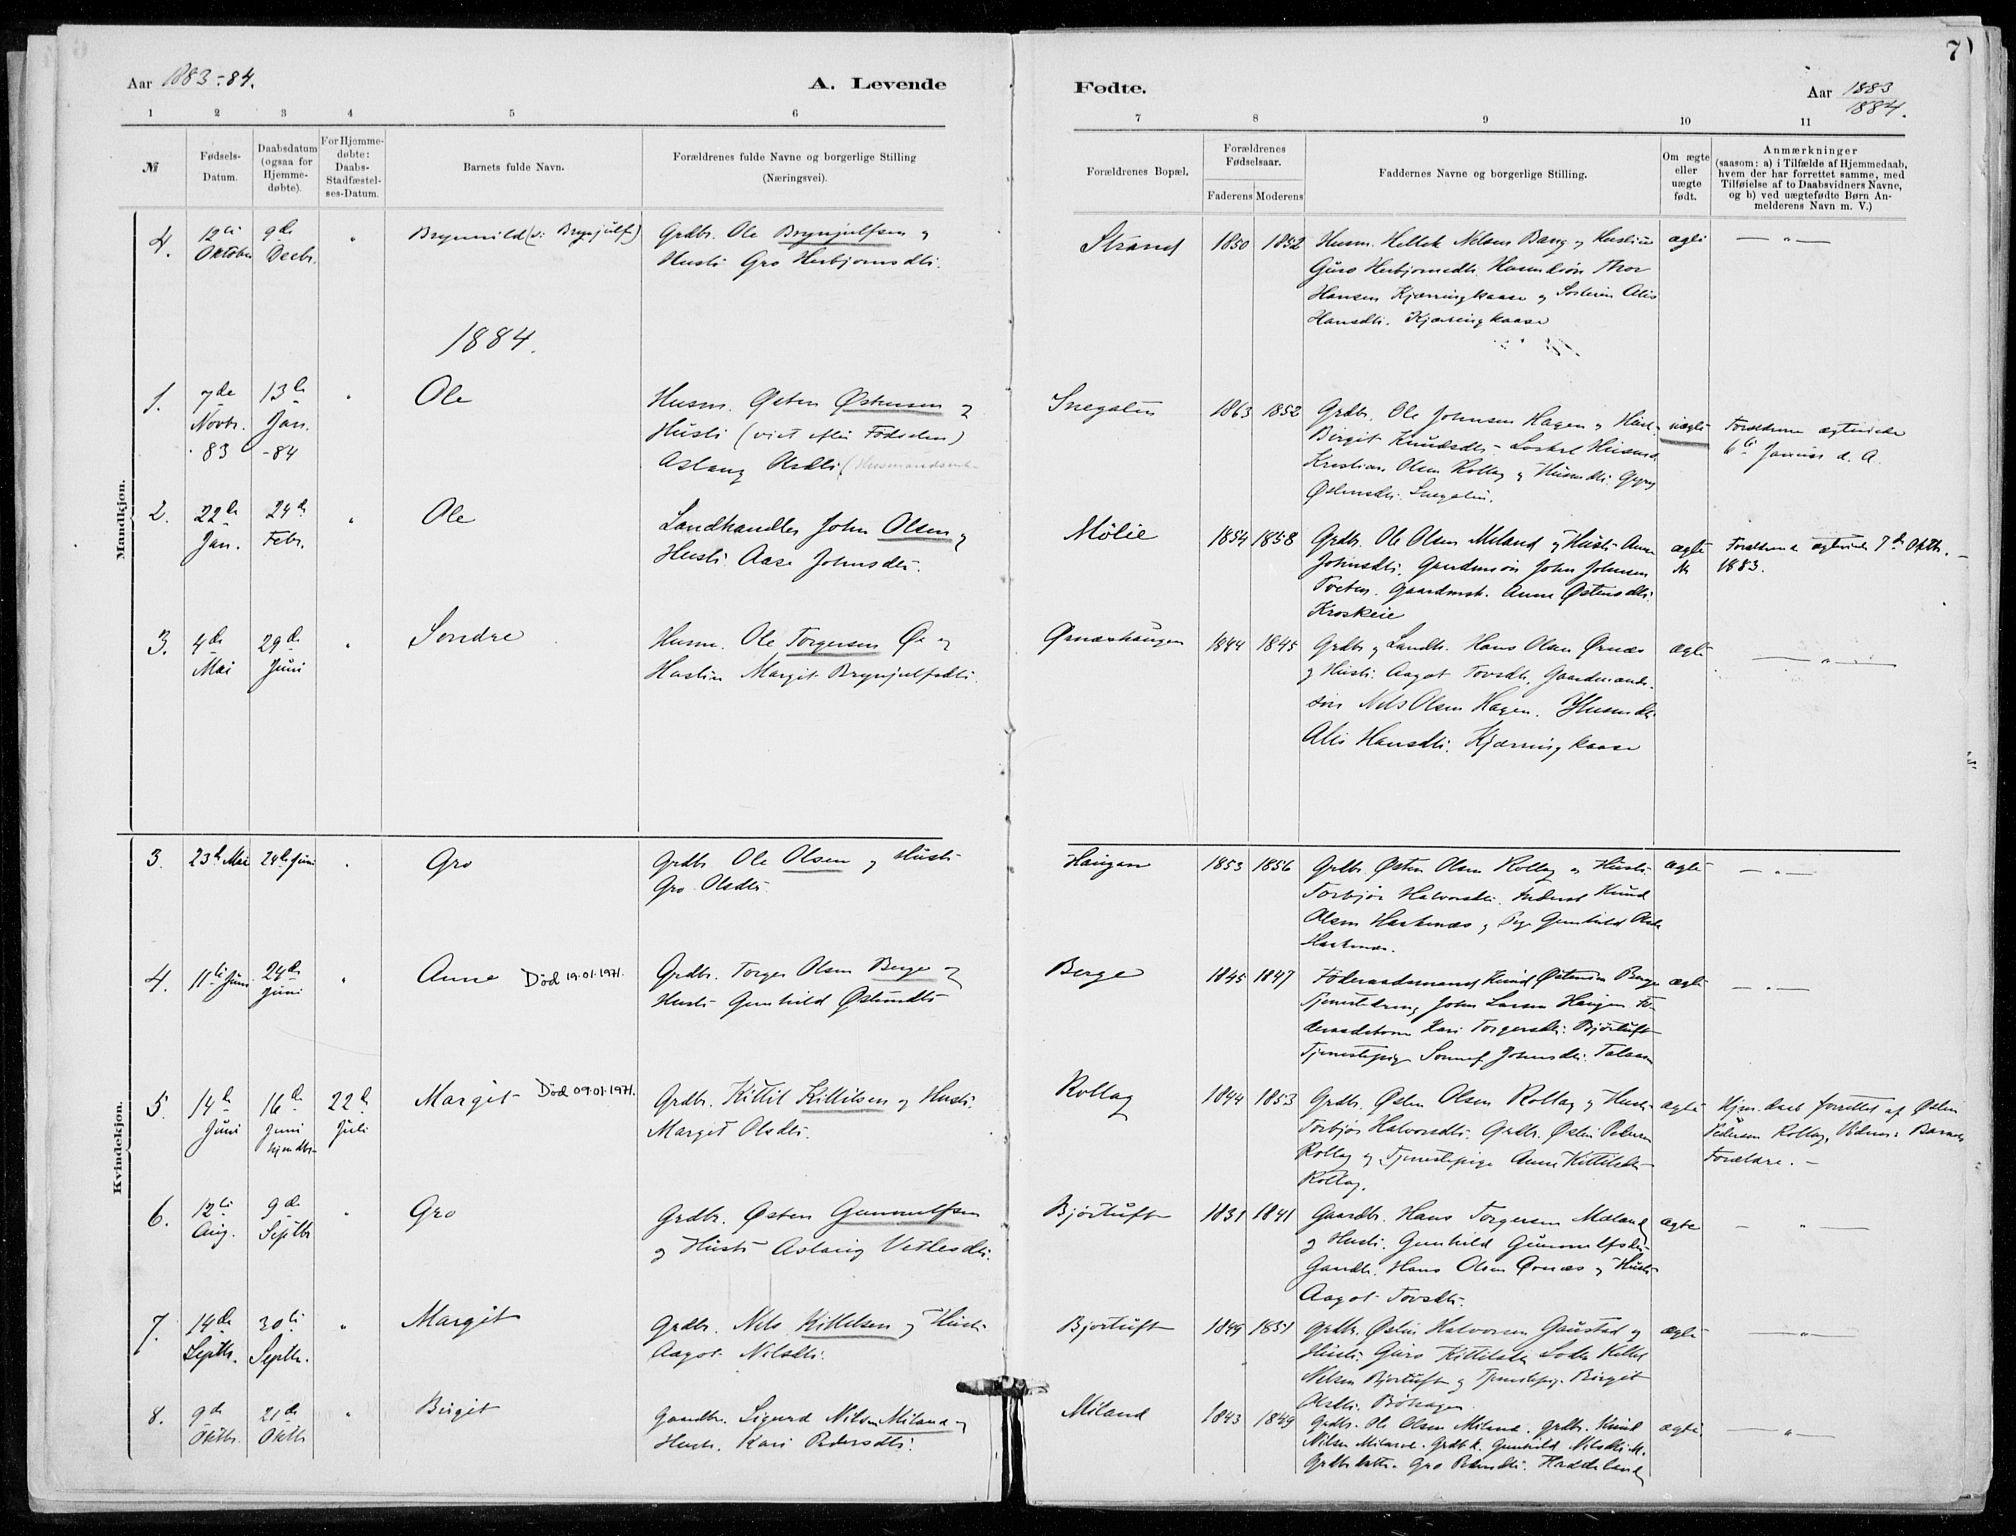 SAKO, Tinn kirkebøker, F/Fb/L0002: Ministerialbok nr. II 2, 1878-1917, s. 7